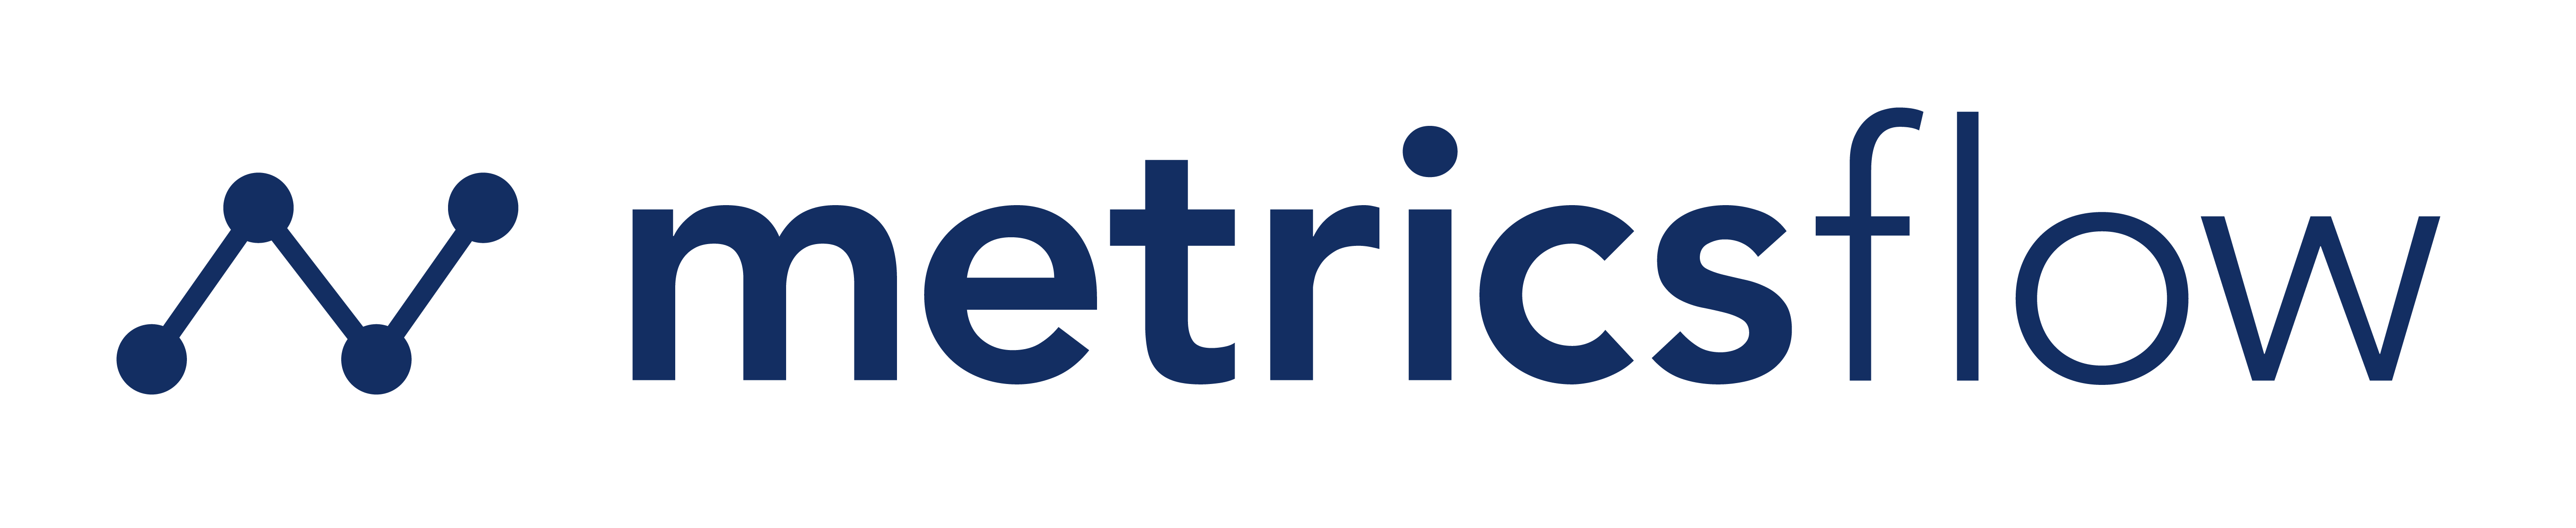 metricsflow logo